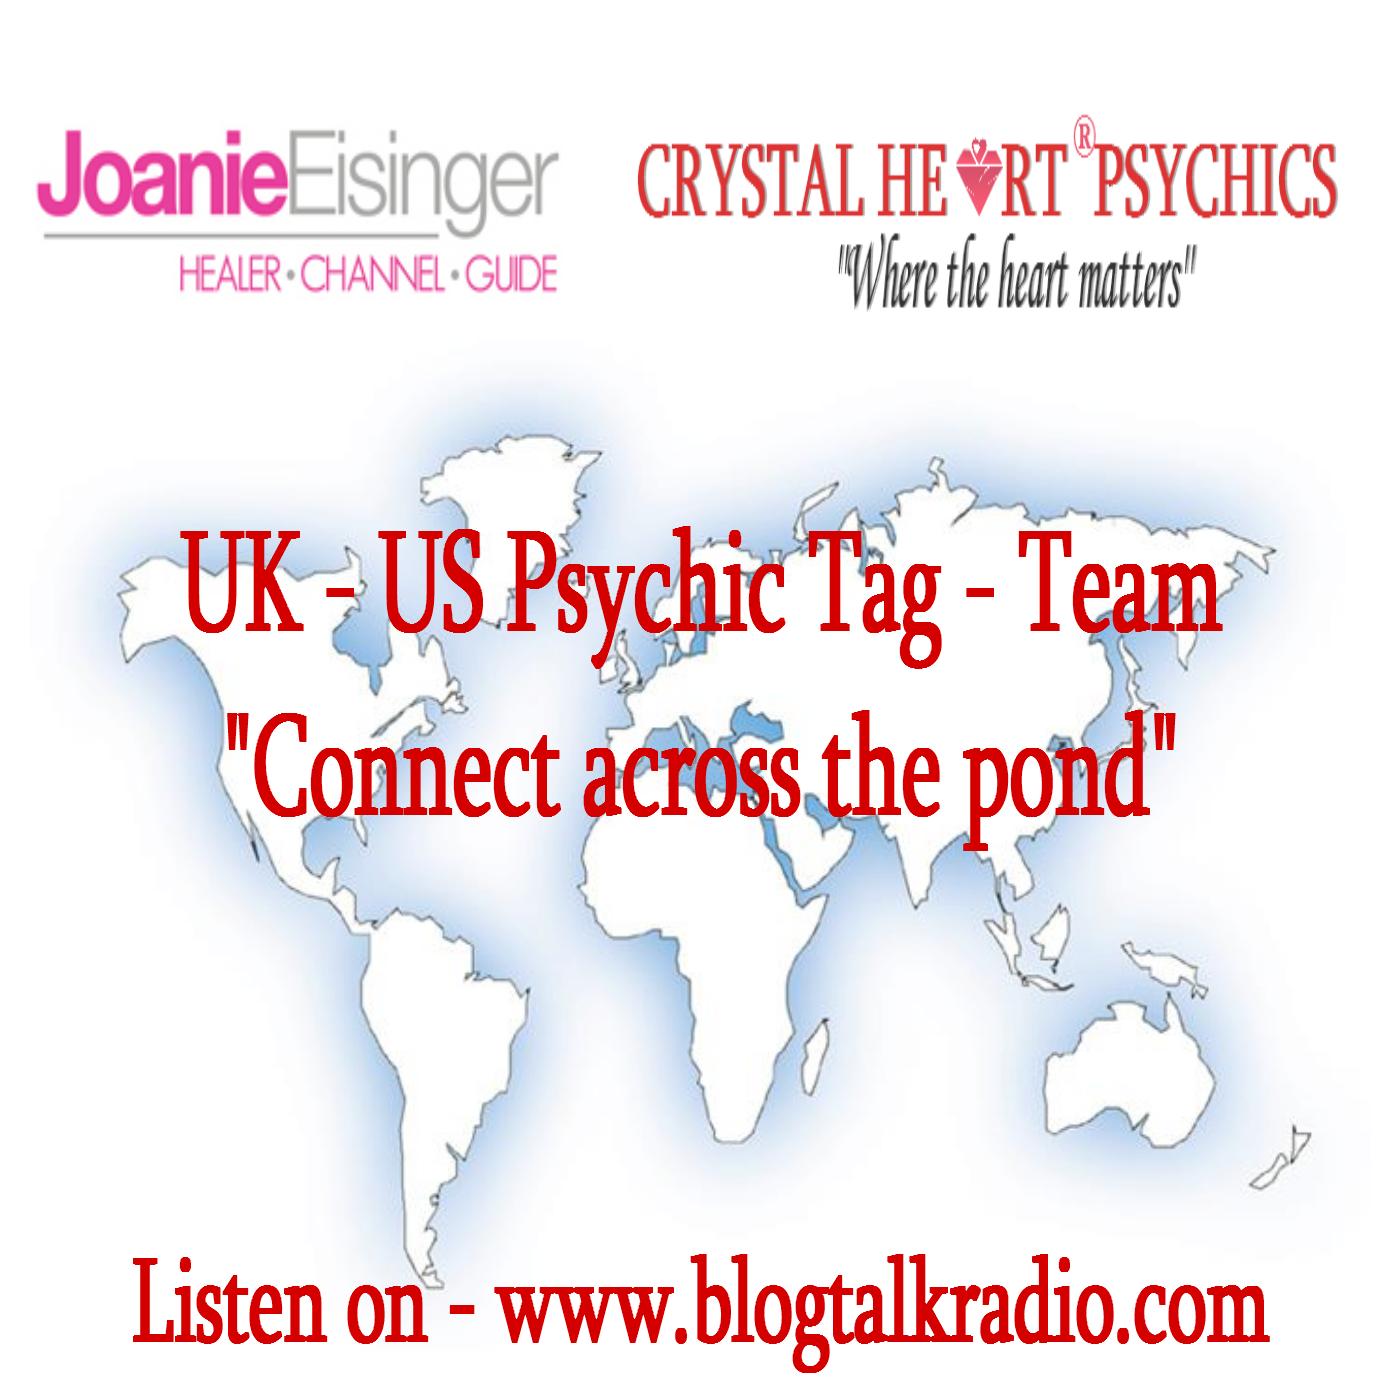 https://www.crystalheartpsychics.com/wp-content/uploads/2018/01/Blog-1400.1400.png